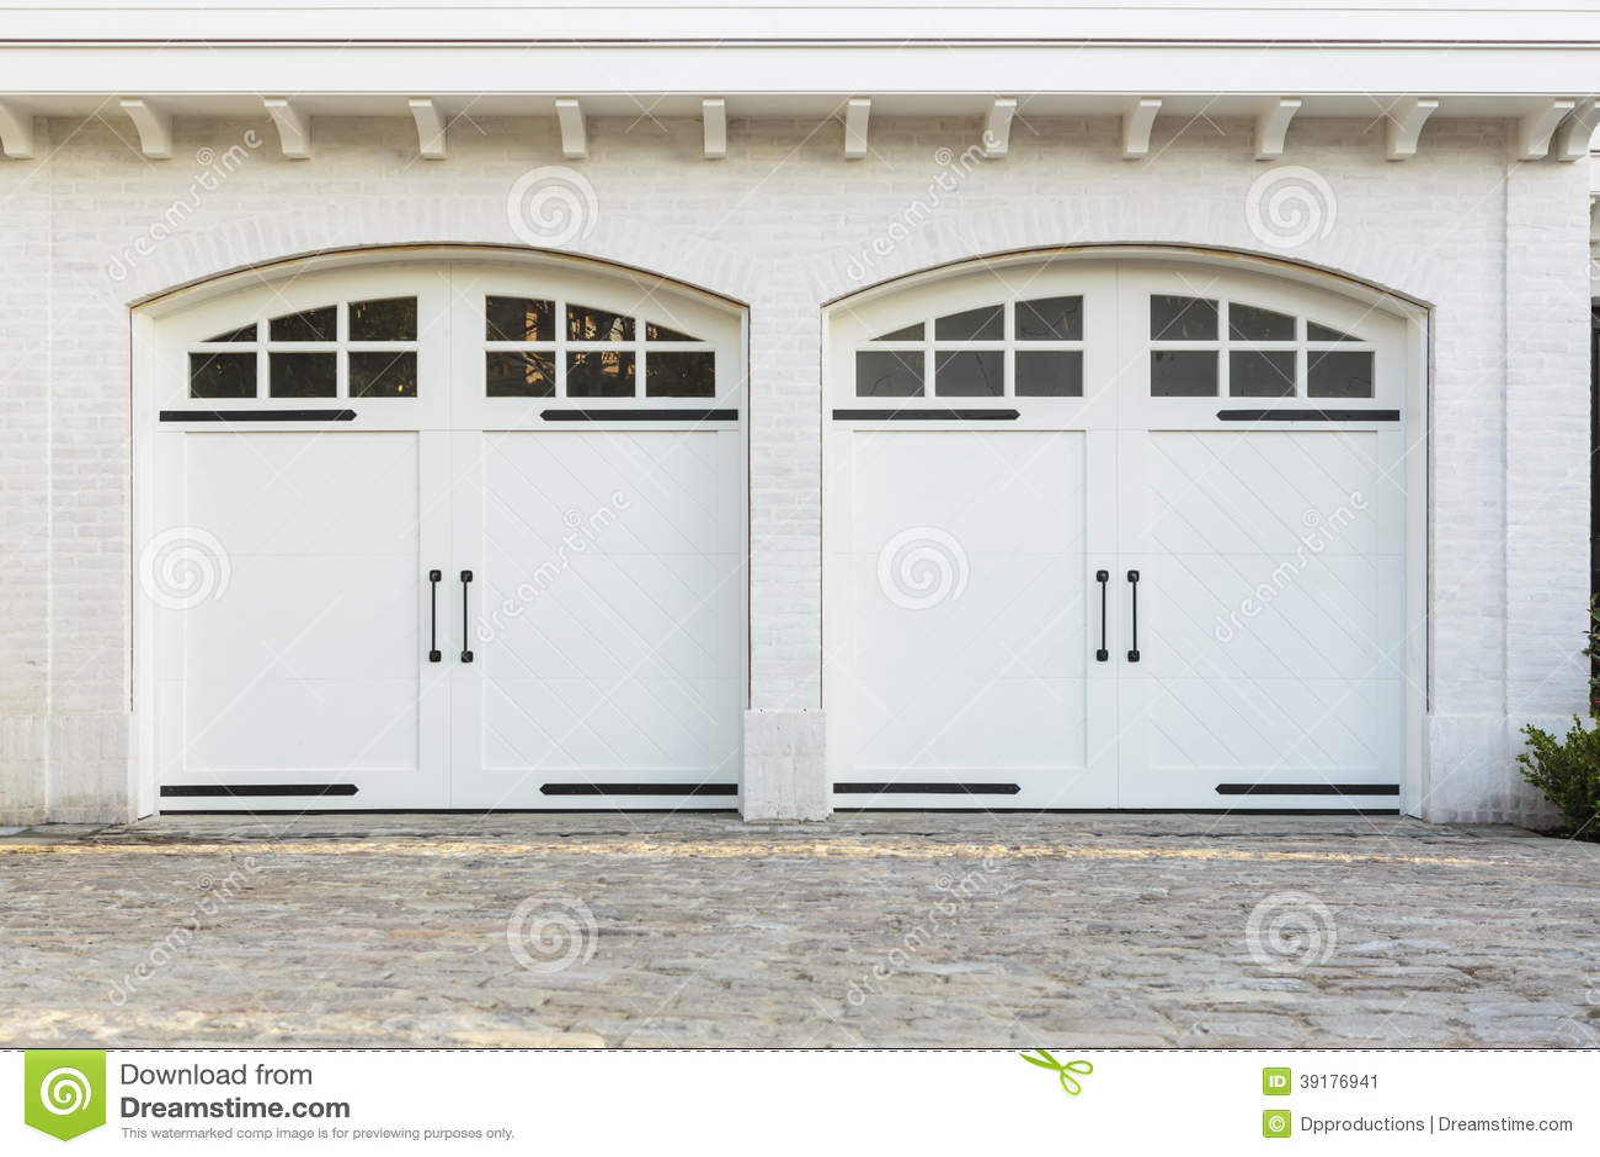 small garage business ideas - Doppie Porte Gemellate Del Garage Ad Una Casa Bianca